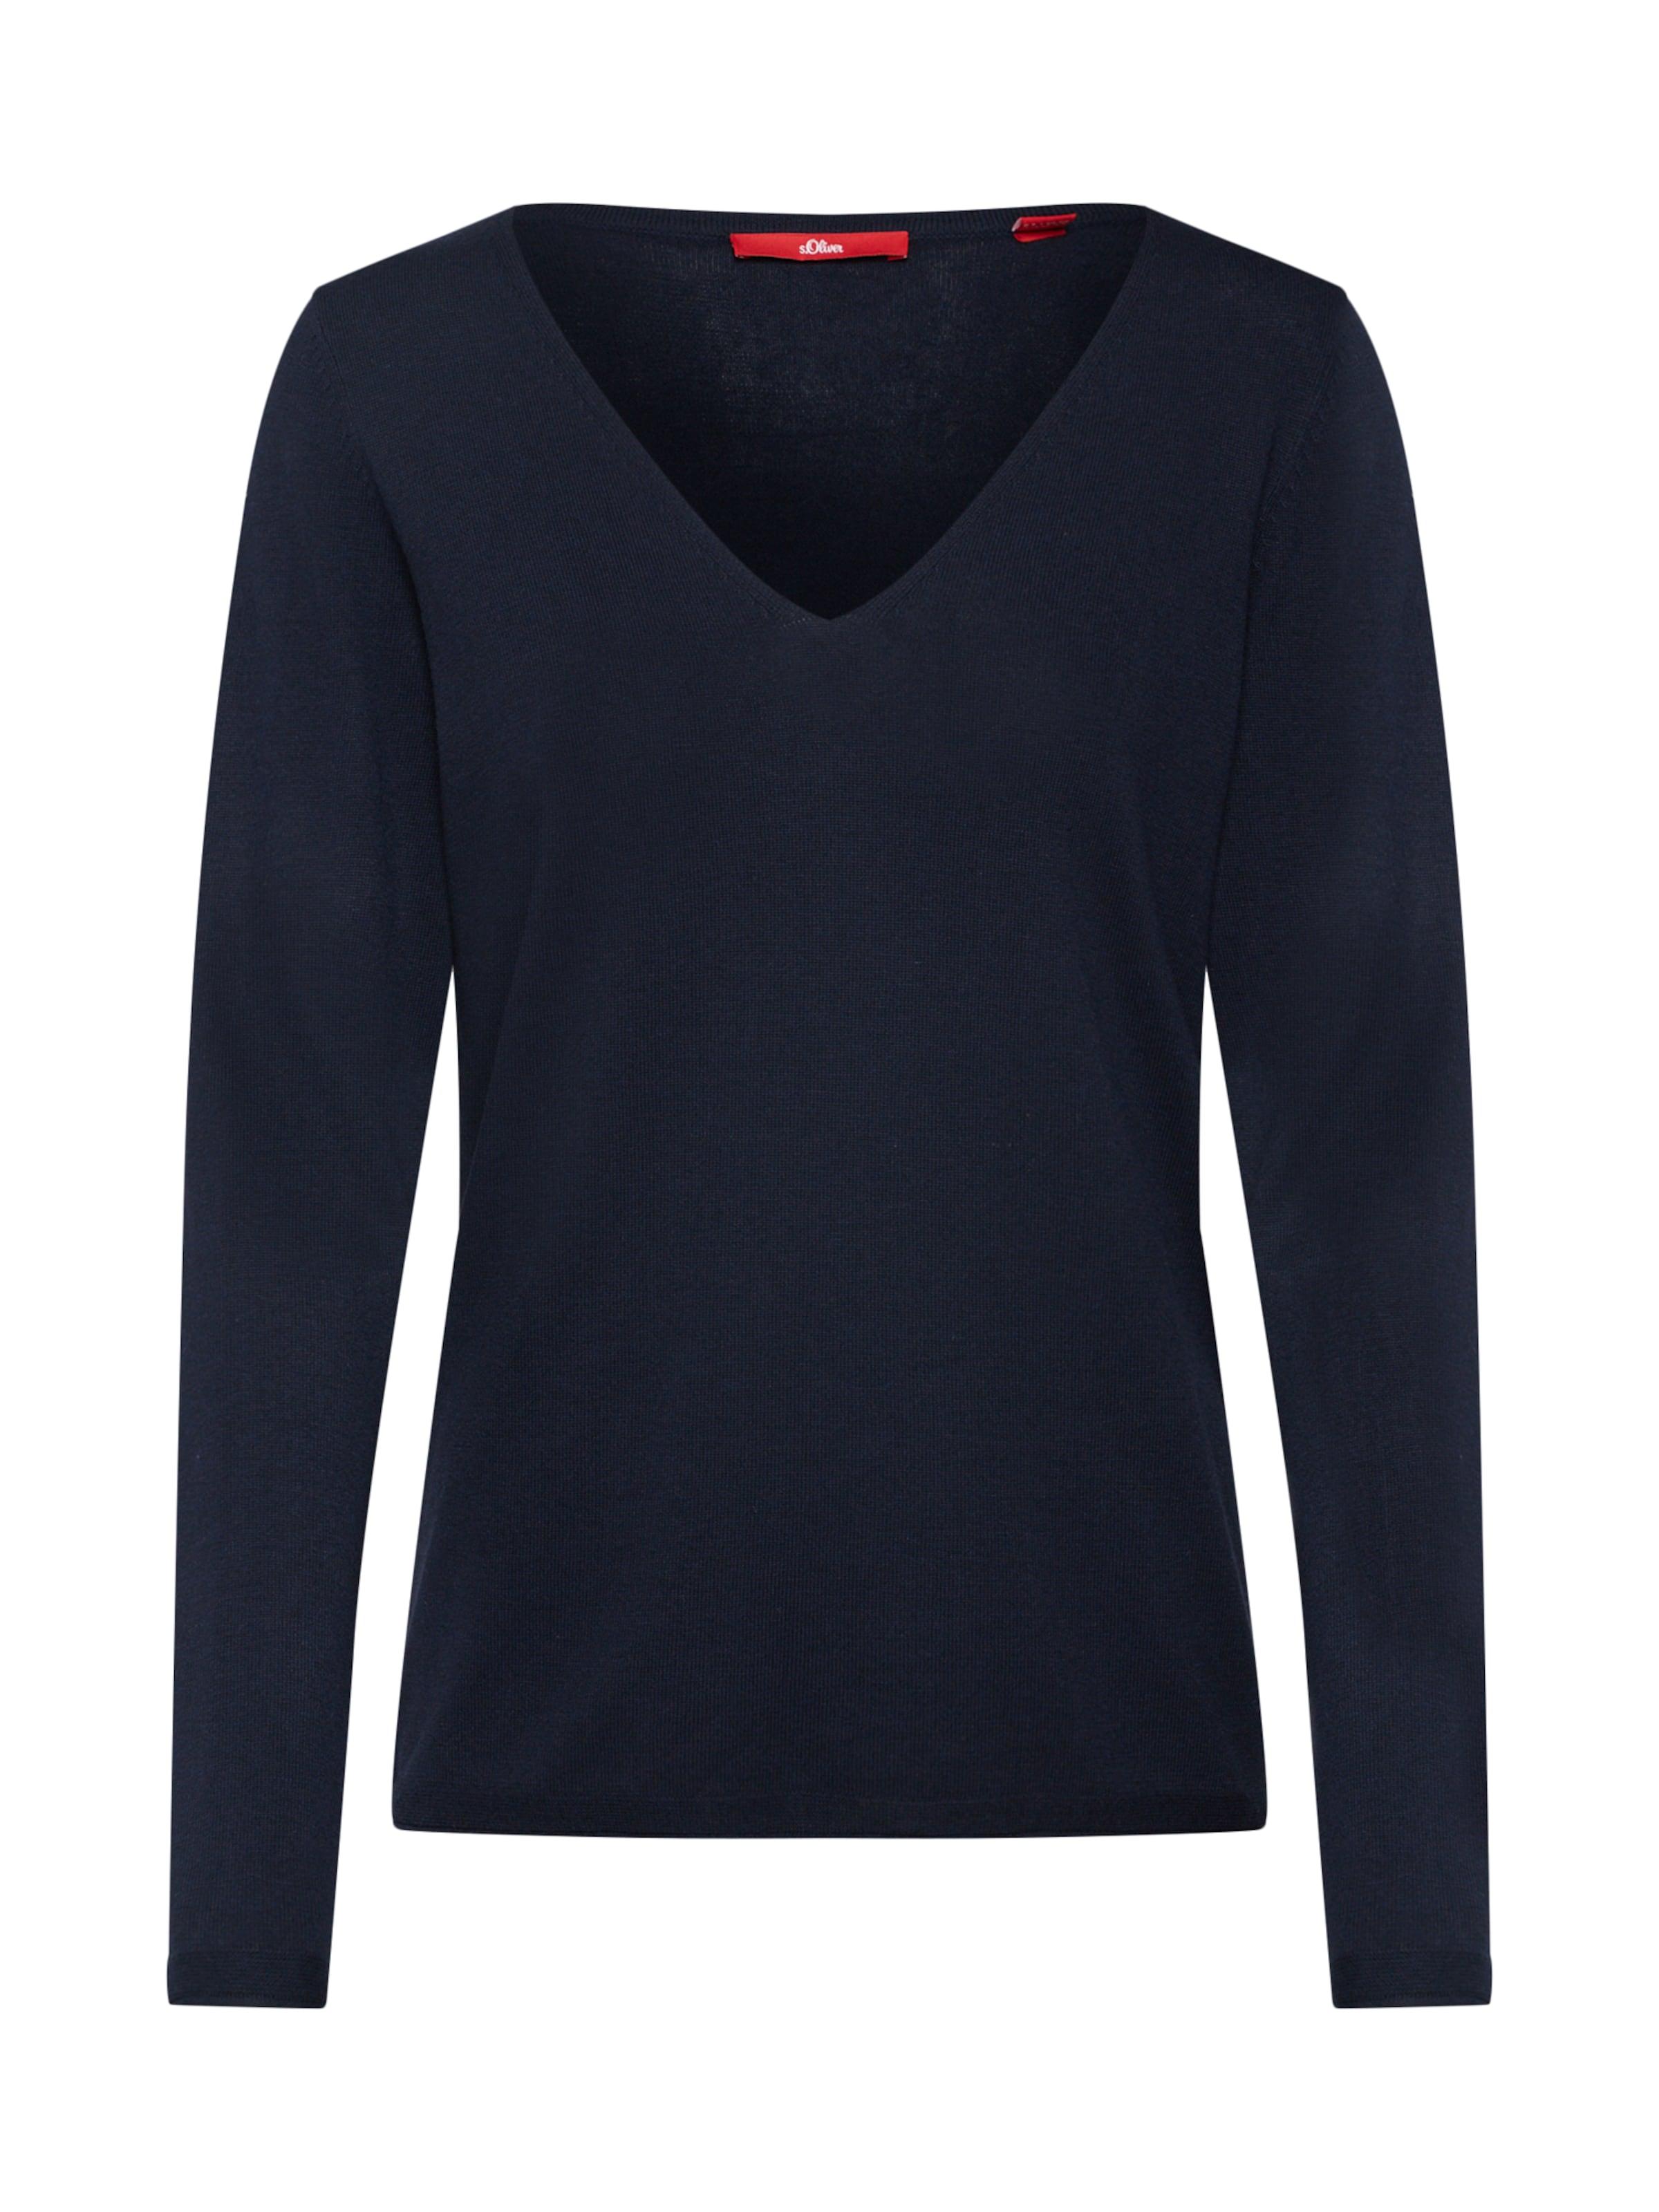 Pullover In Nachtblau oliver S S oliver yvwN0m8nO